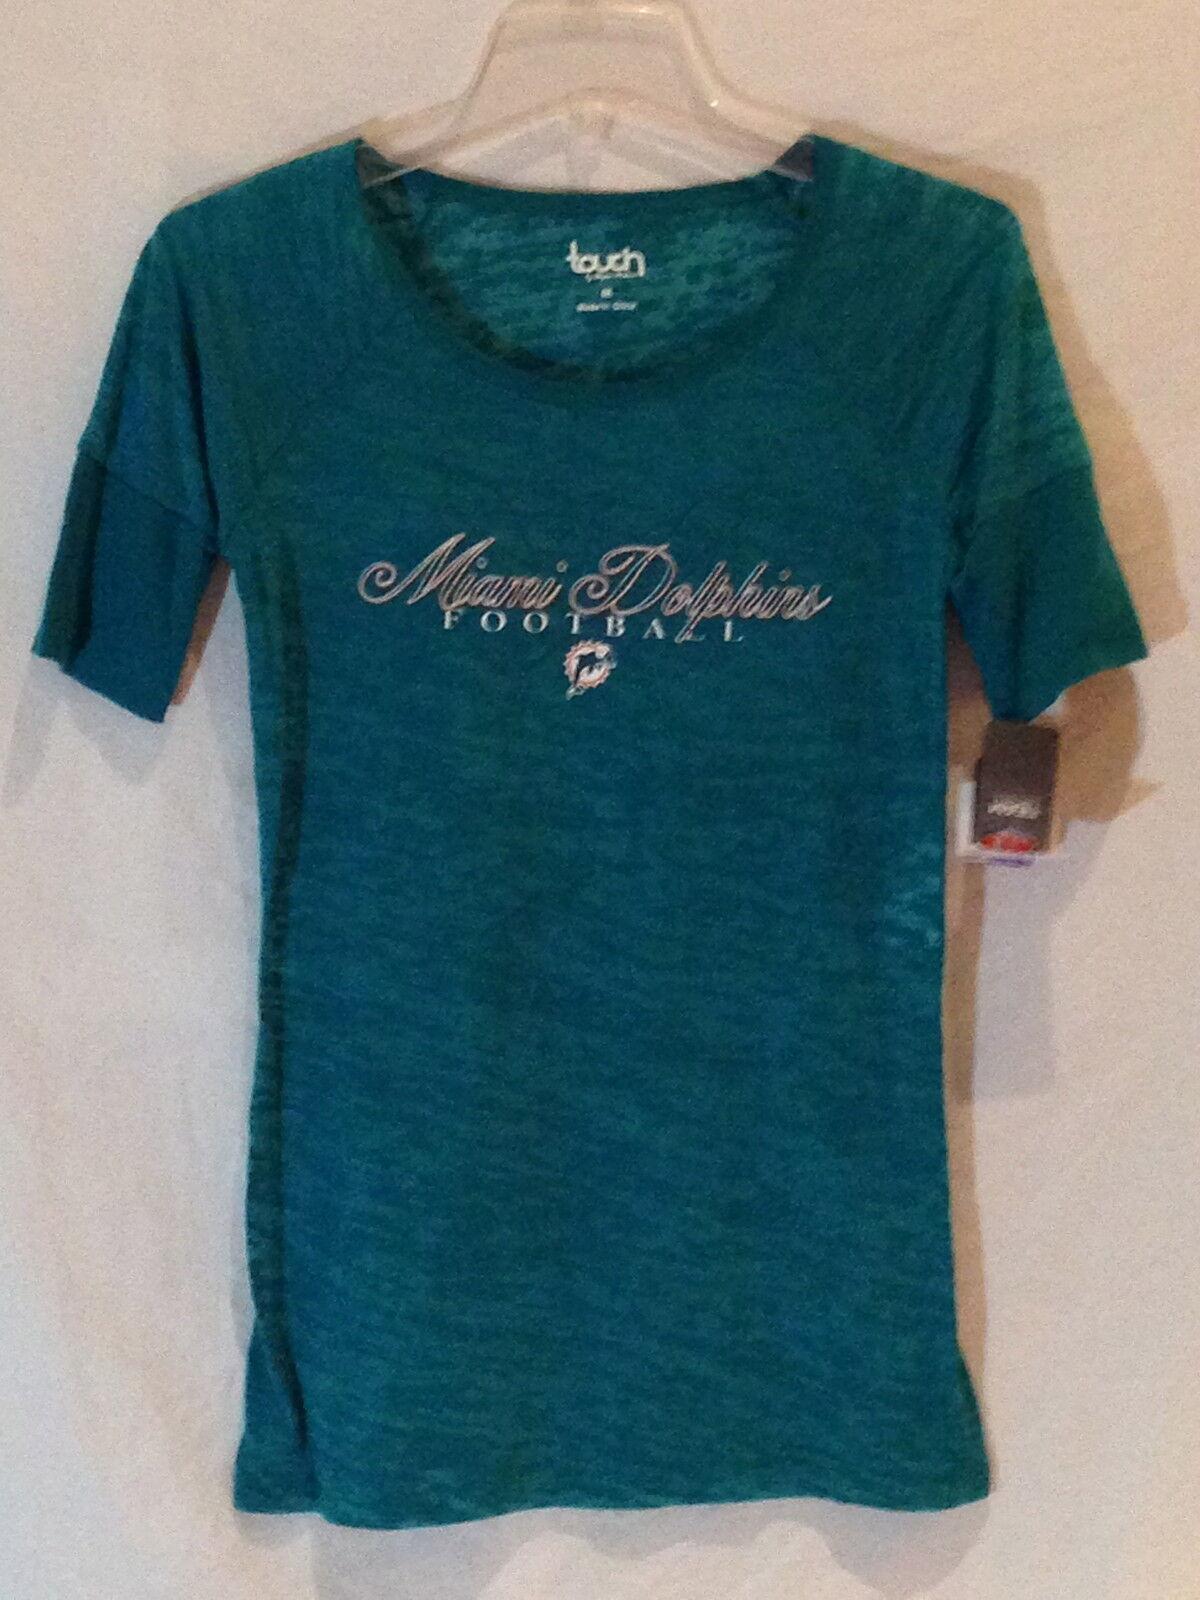 Miami Dolphins Alyssa Milano Milano Milano Touch Sammlung Shirt-Small-  1 Bestseller 9fb9c9